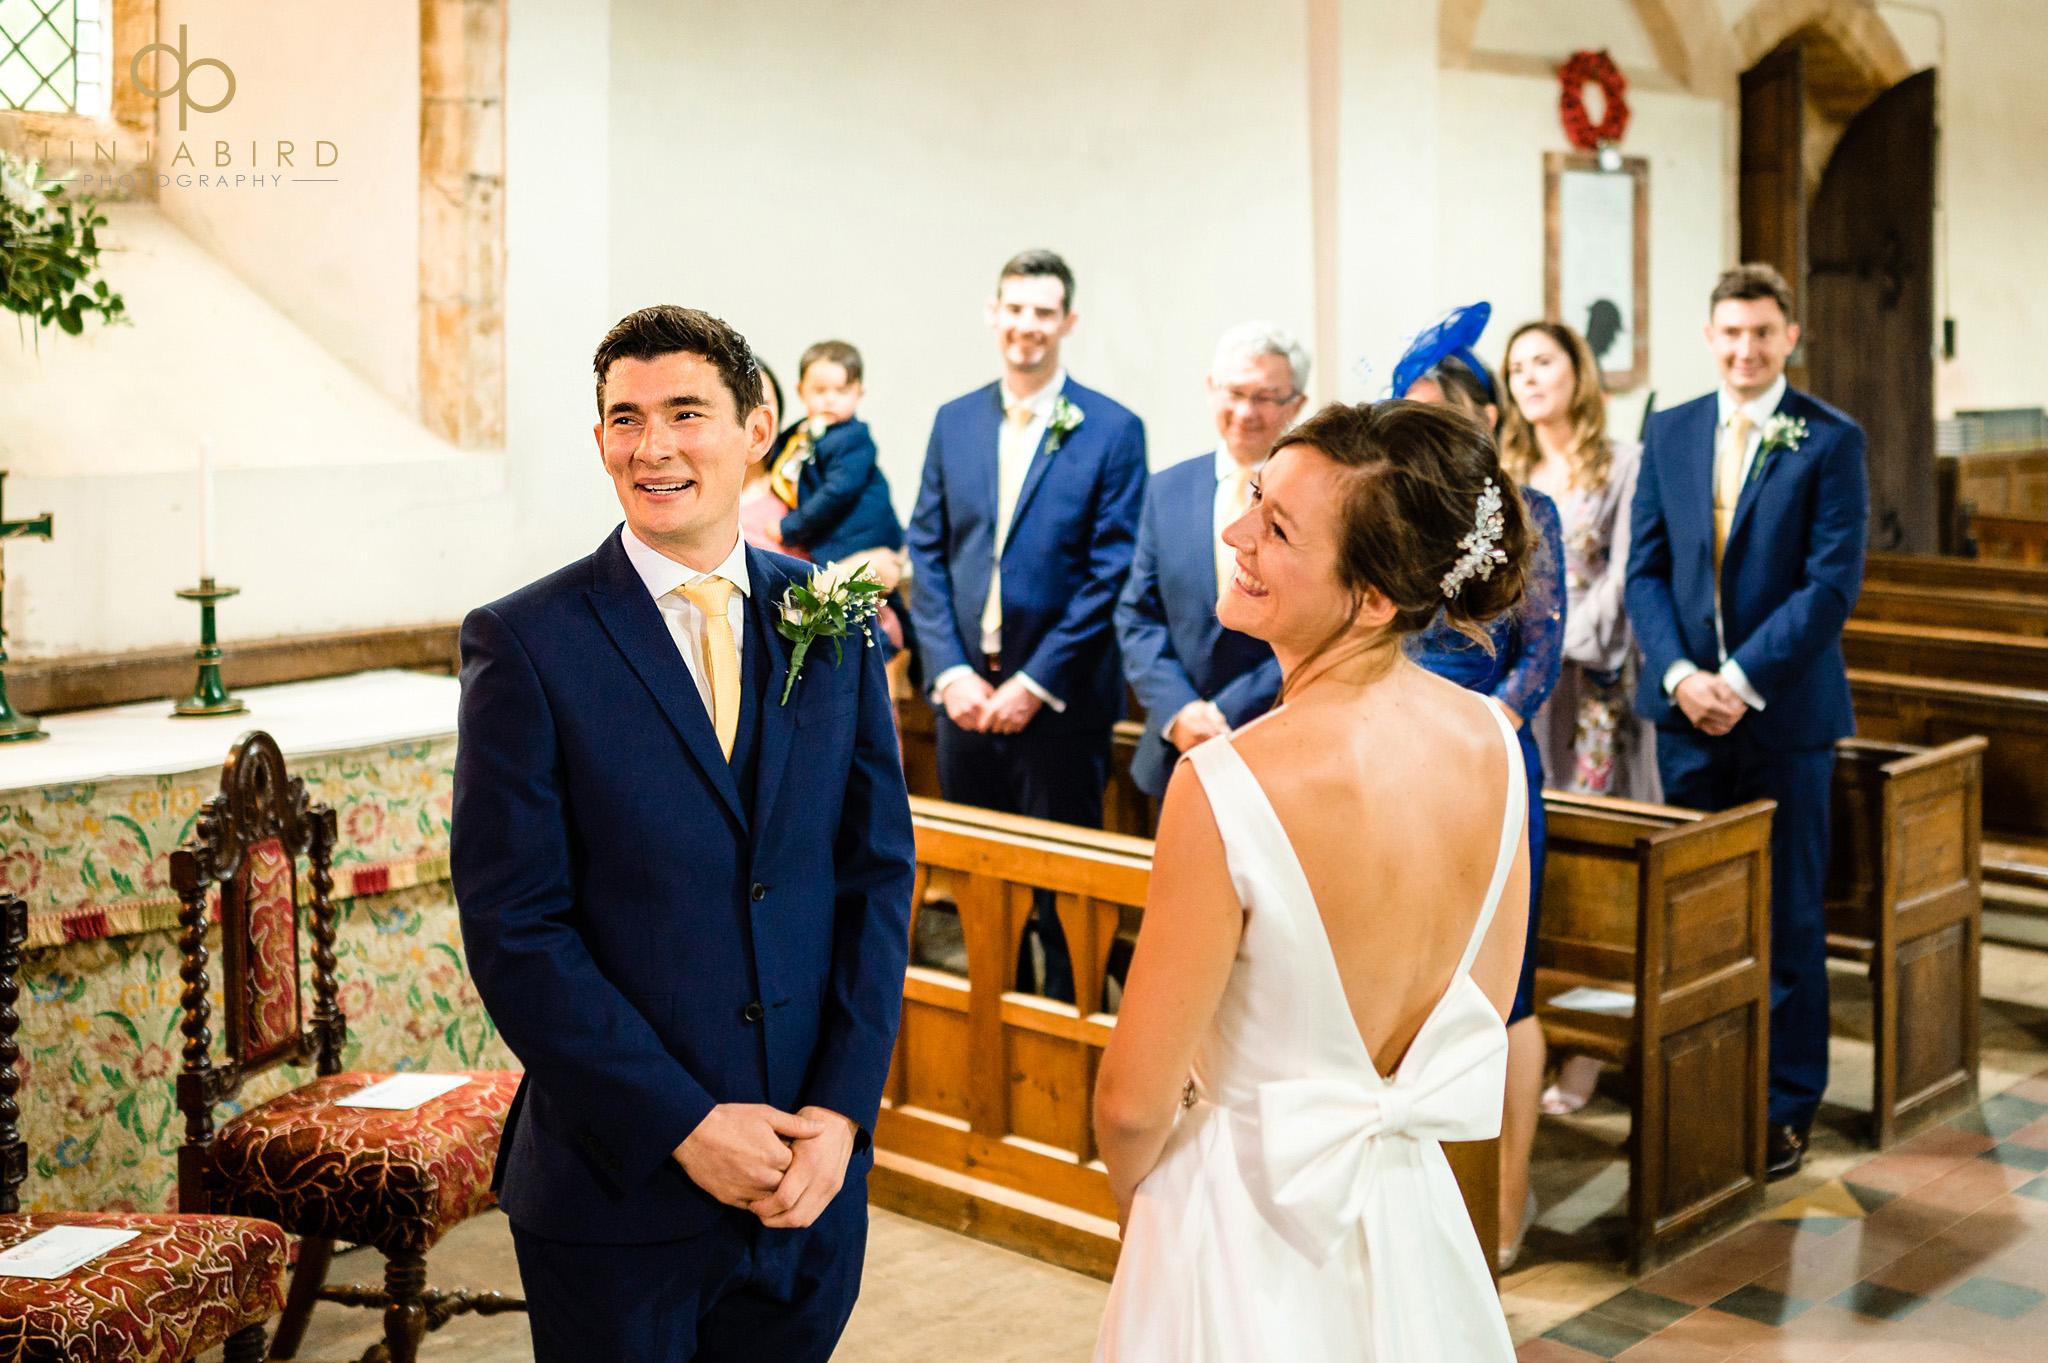 dodford weddings